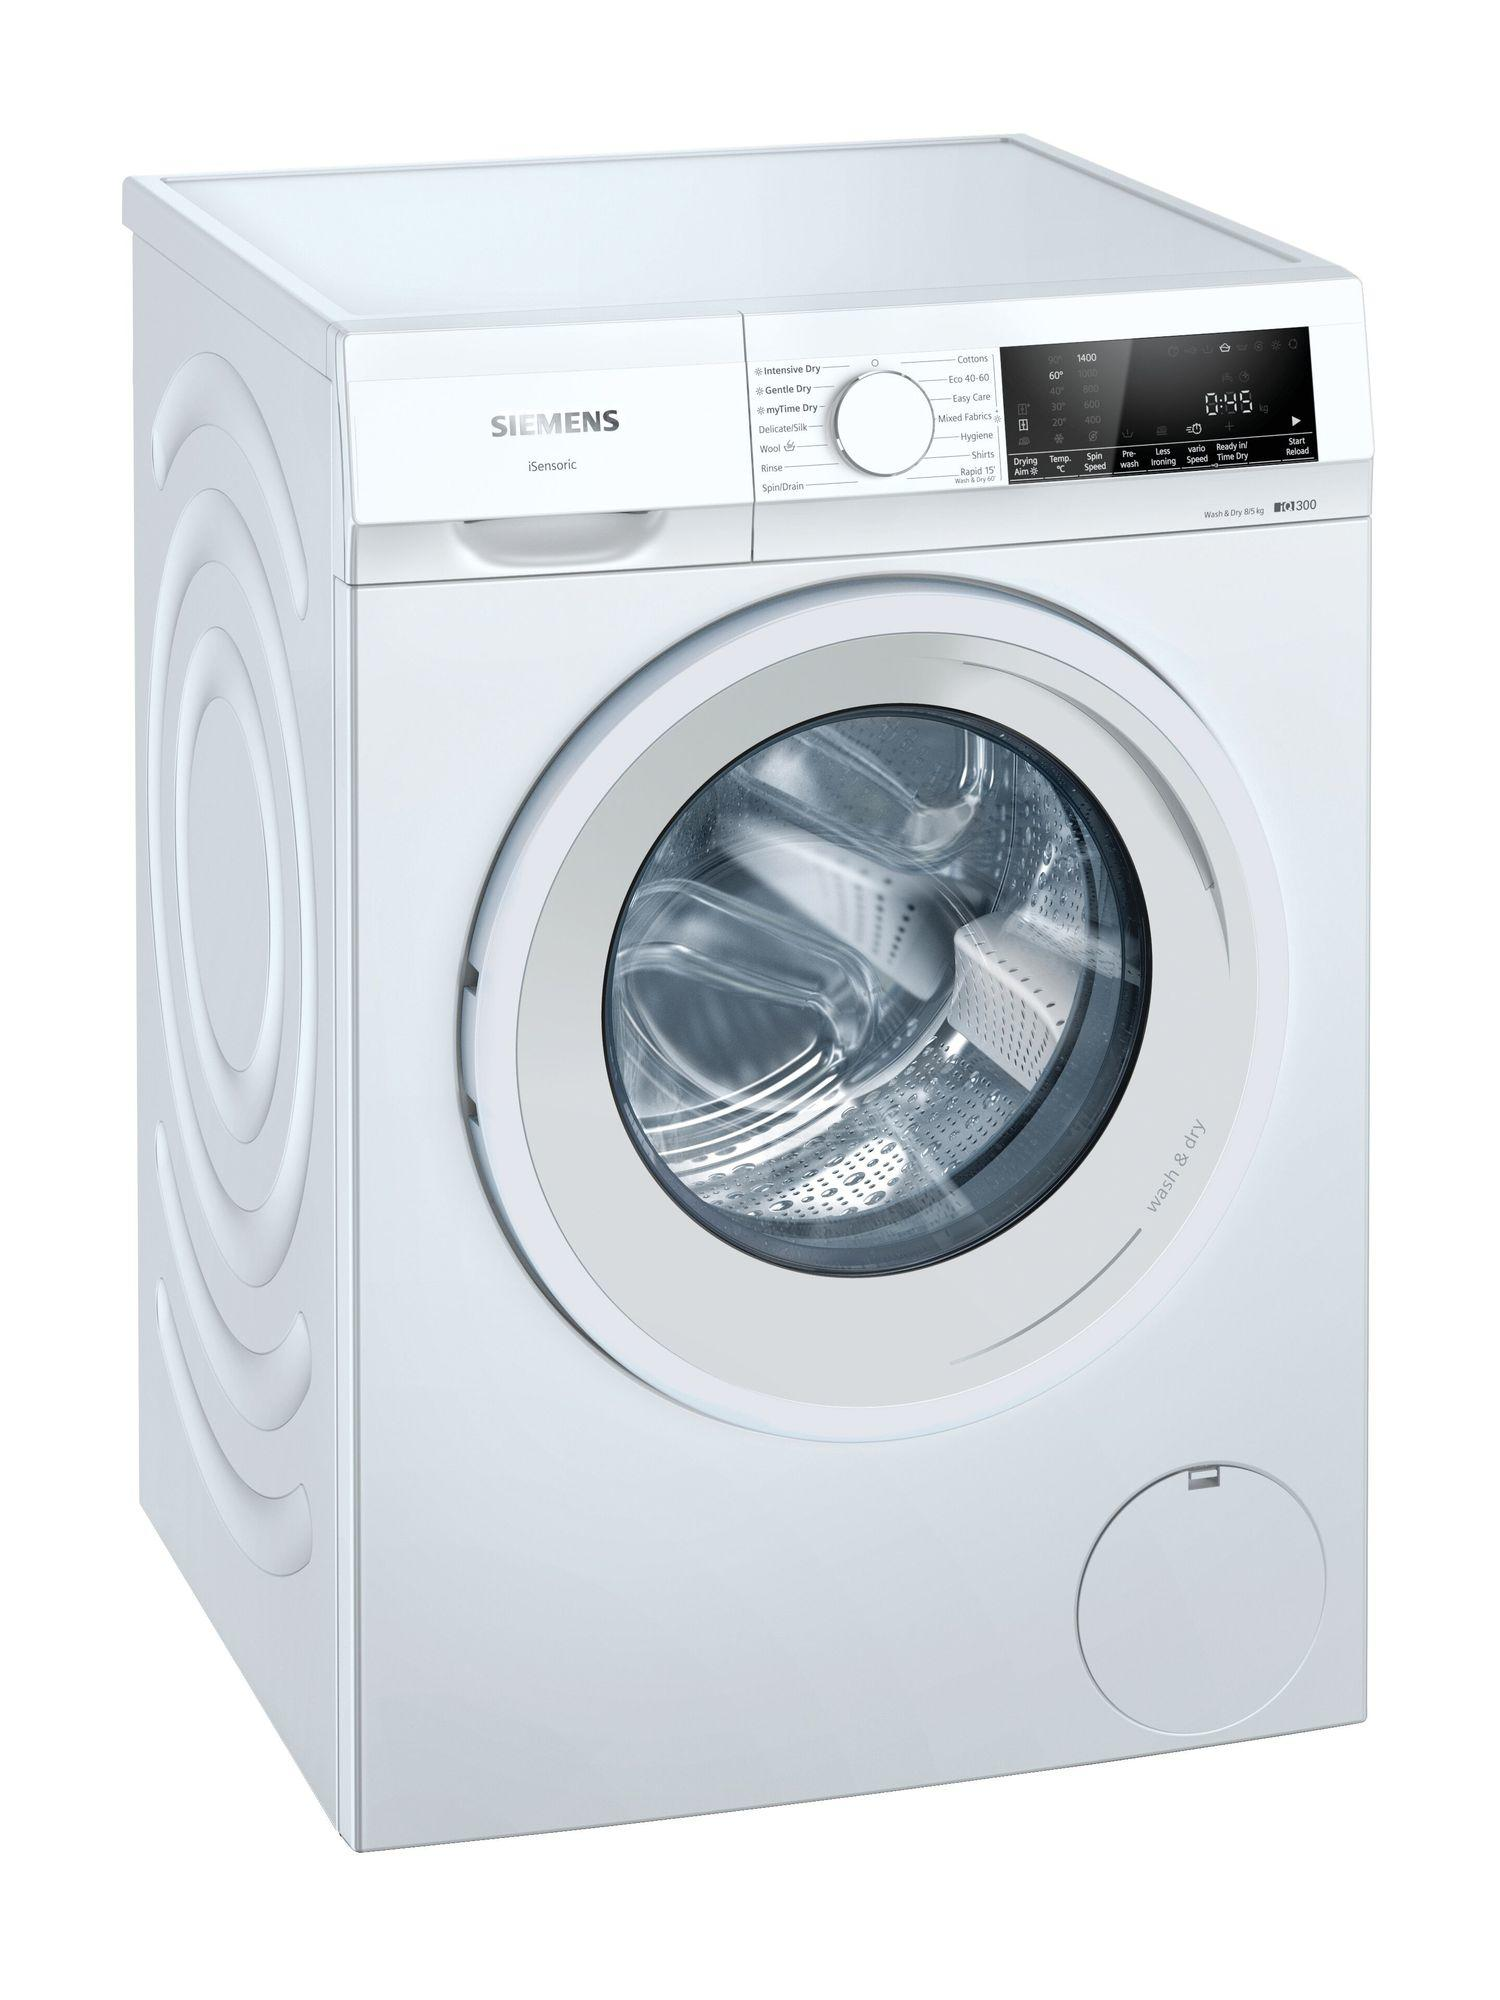 Washer Dryers iQ300 WN34A1U8GB 8Kg Wash 5Kg Dry 1400 Spin Washer Dryer | White